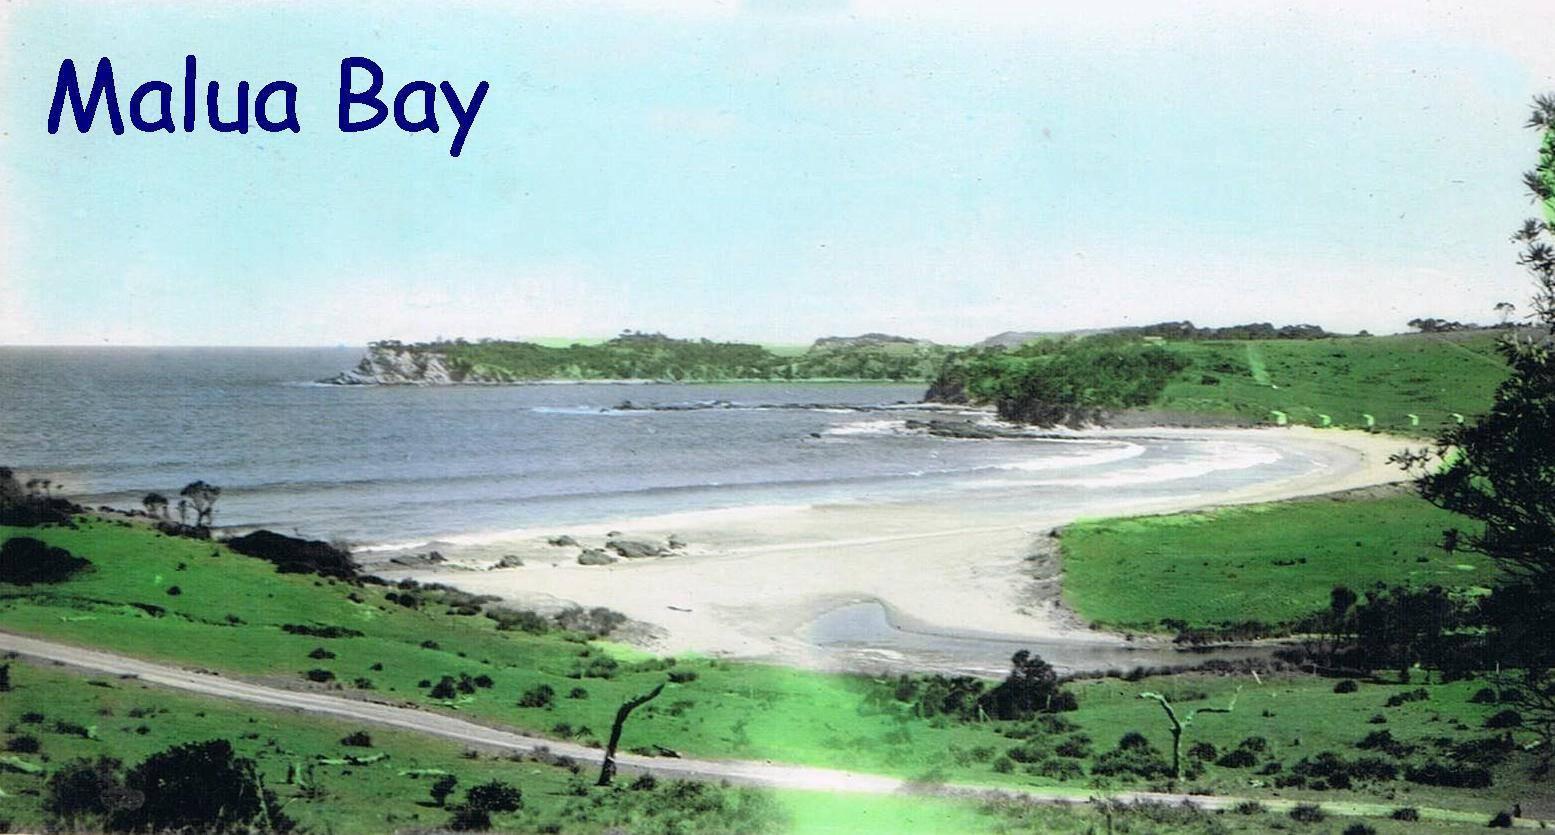 Malua Bay, Late1950s/early1960s